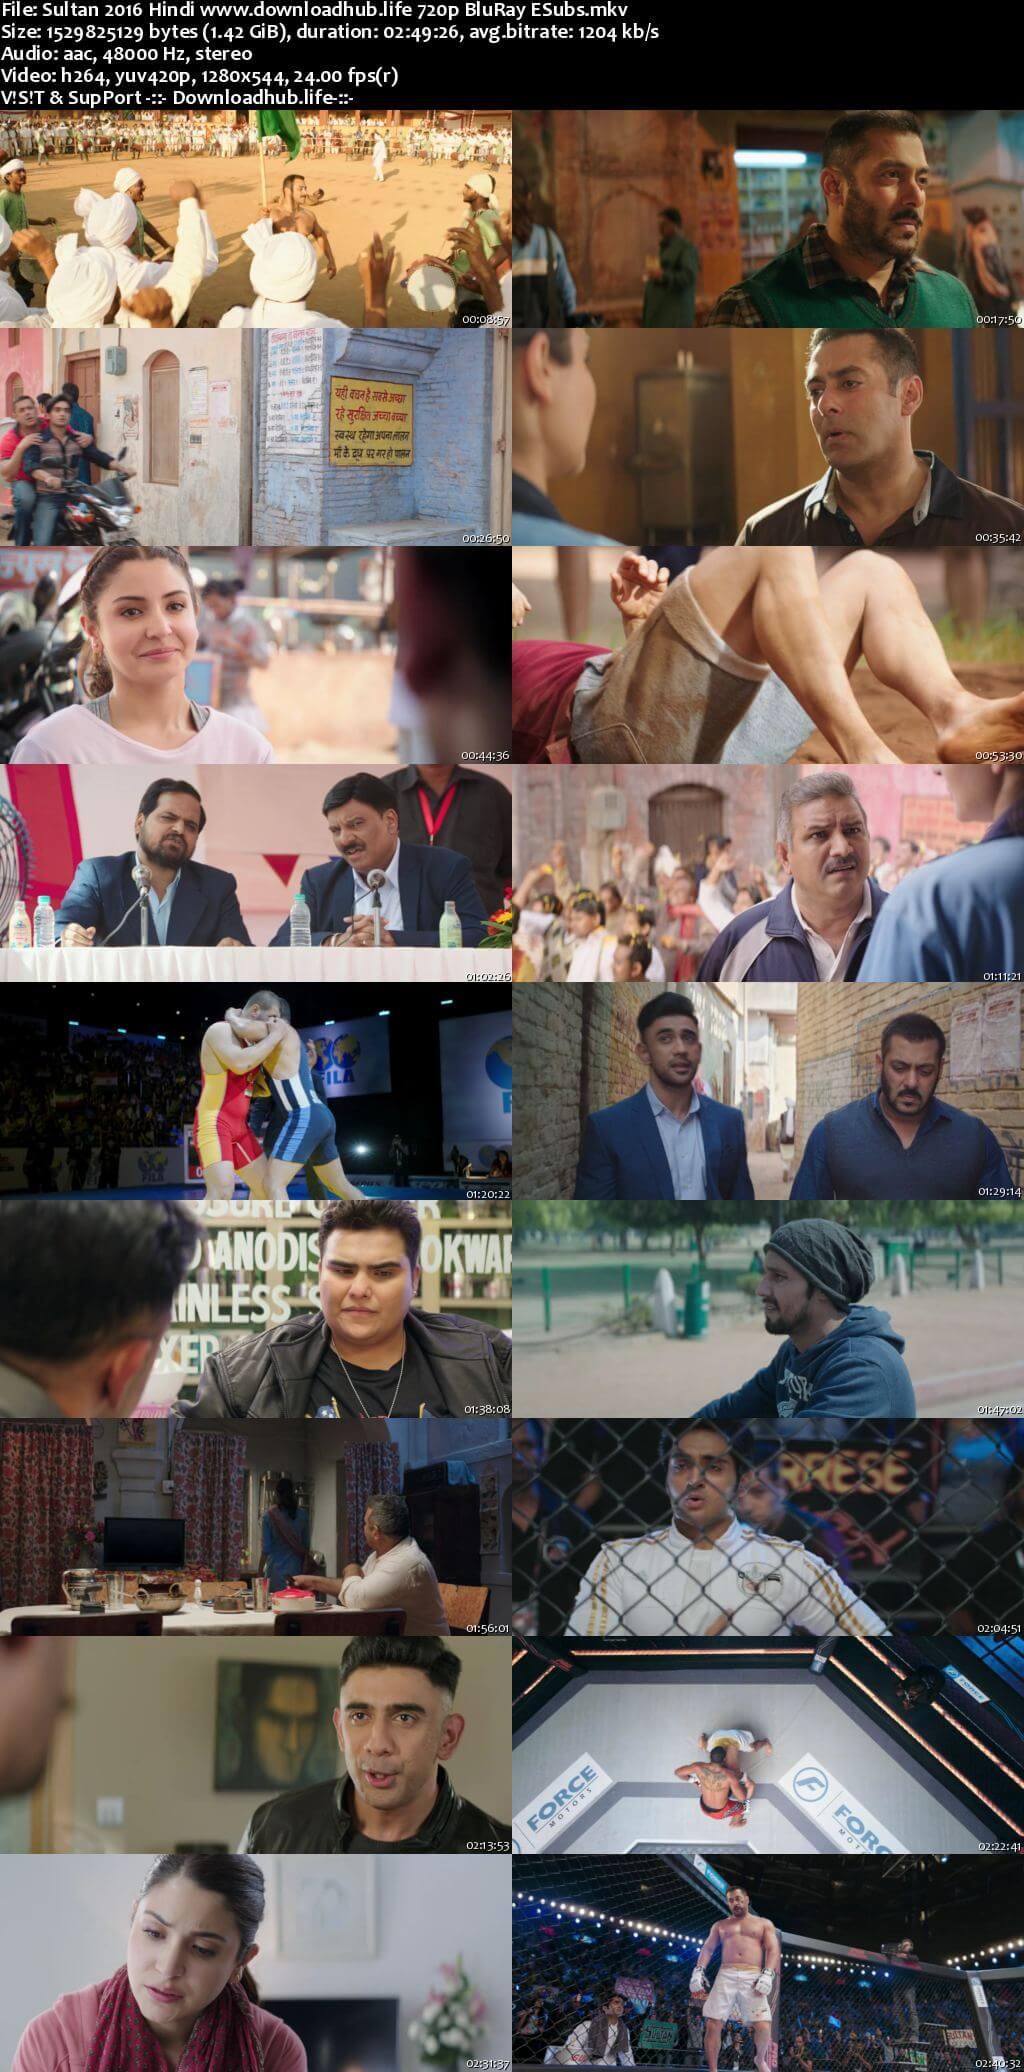 Sultan 2016 Hindi 720p BluRay ESubs